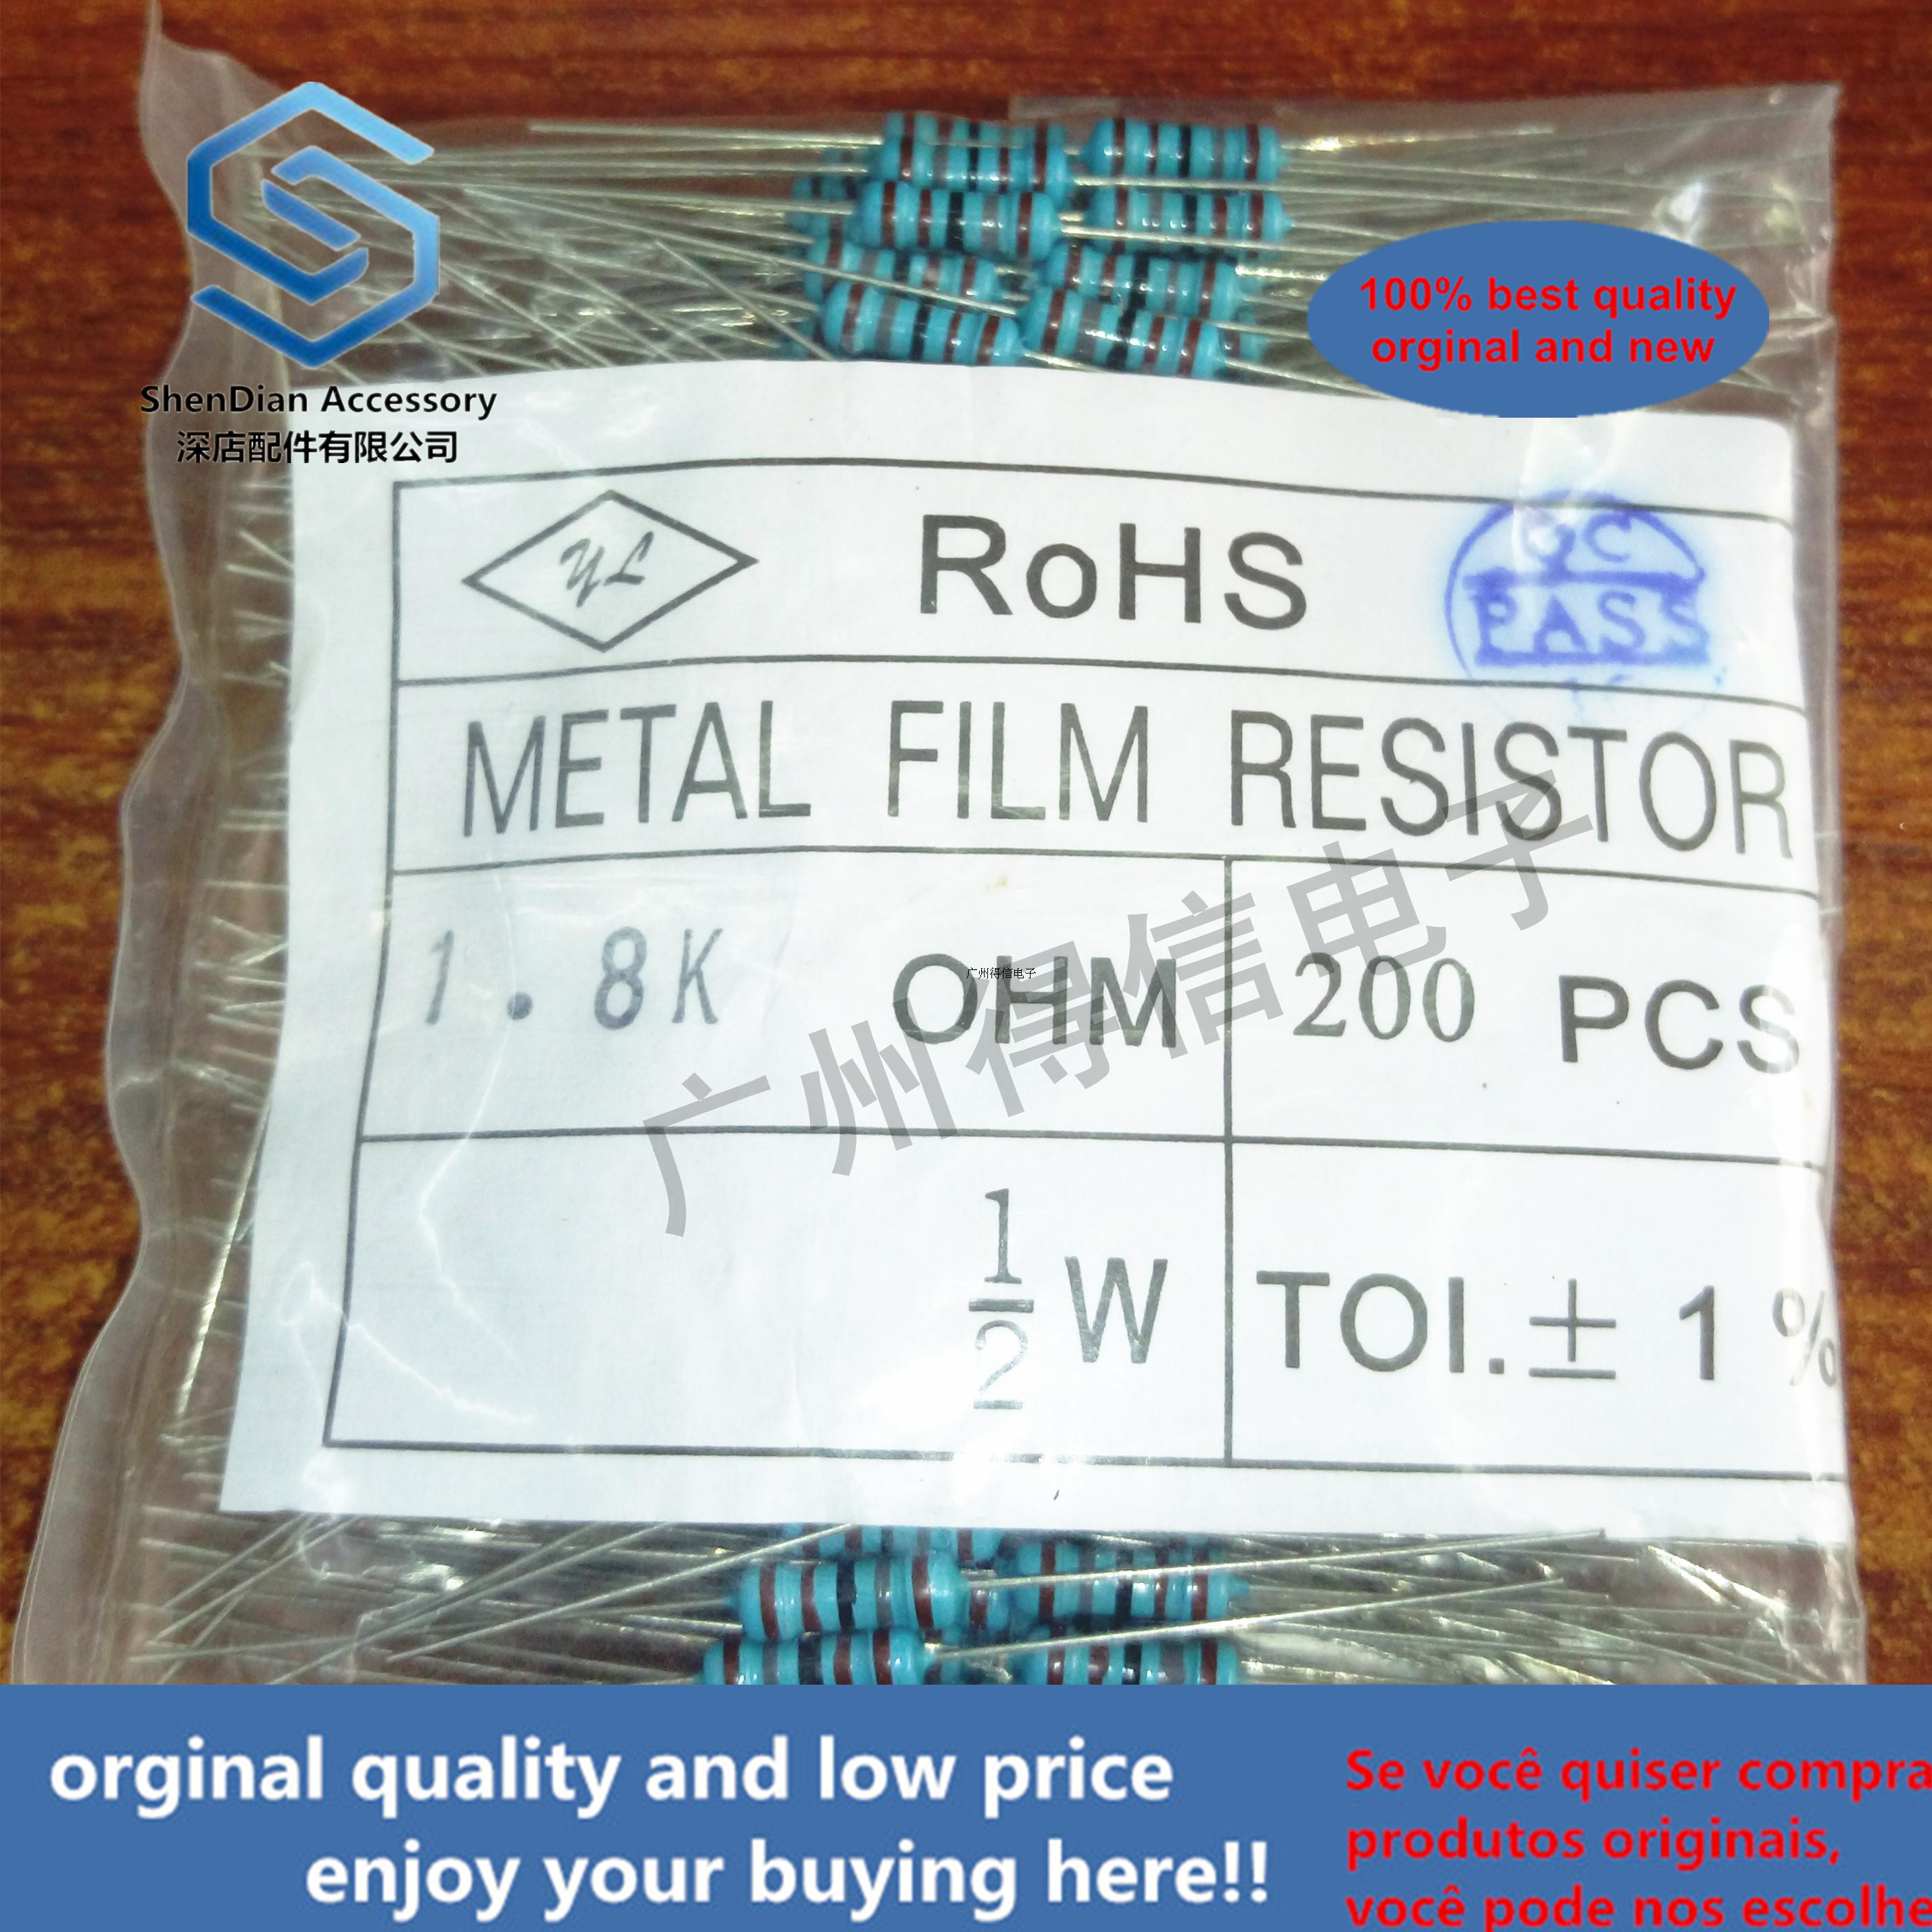 200pcs 1 / 2W 1.3R 1.3 Euro 1% Brand New Metal Film Iron Feet Resistance Bag Pack 200 Pcs